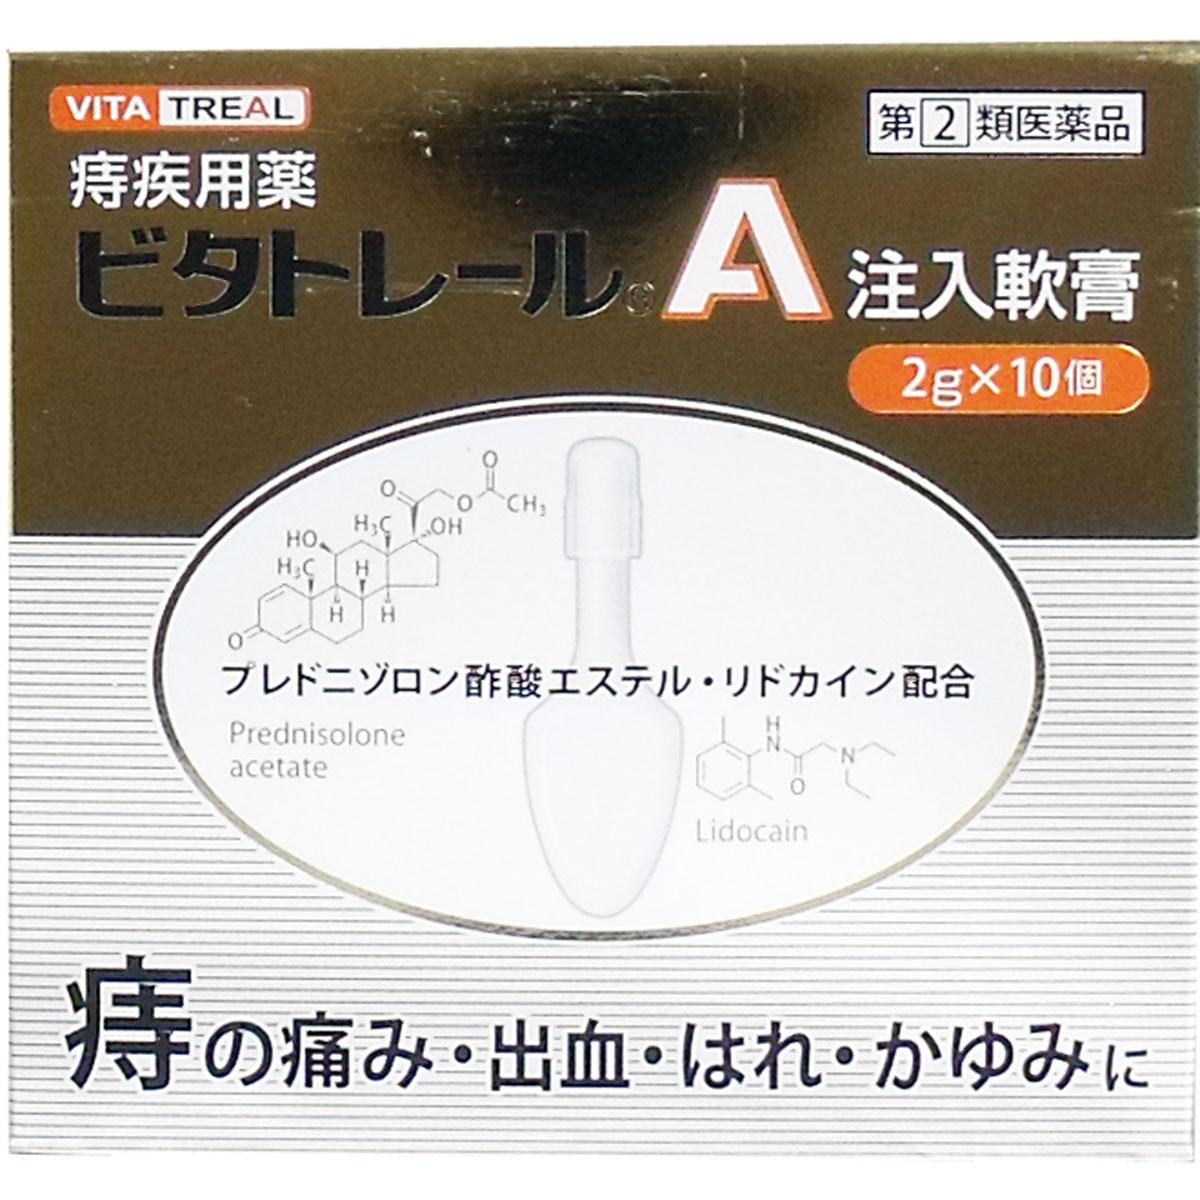 【第(2)類医薬品】 痔疾薬 ビタトレール A注入軟膏 2gX10個入